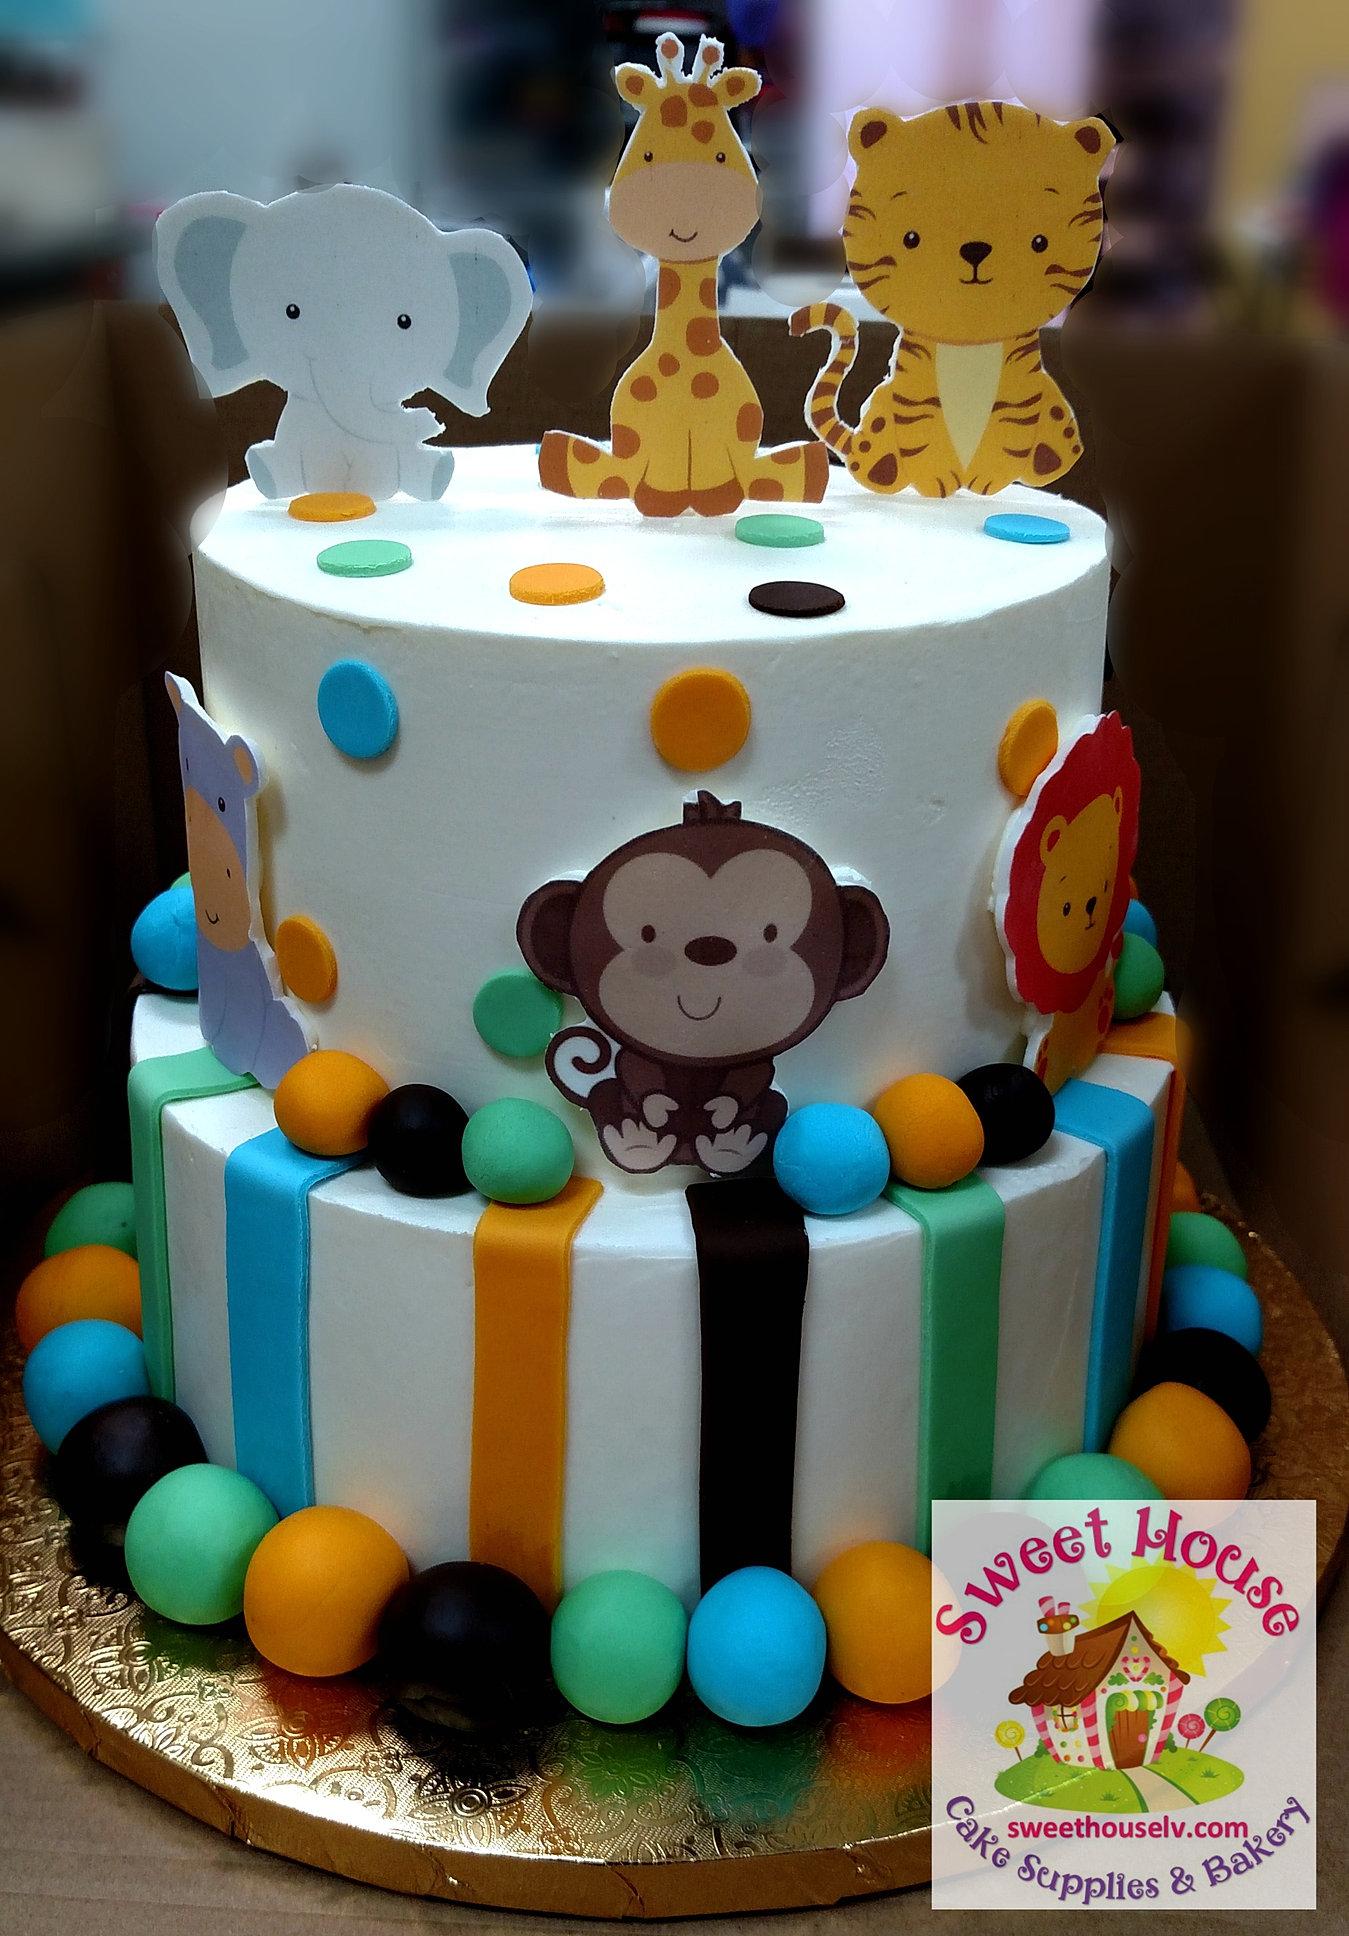 Sweet House Cake Supply  Bakery  Baby Shower Cakes